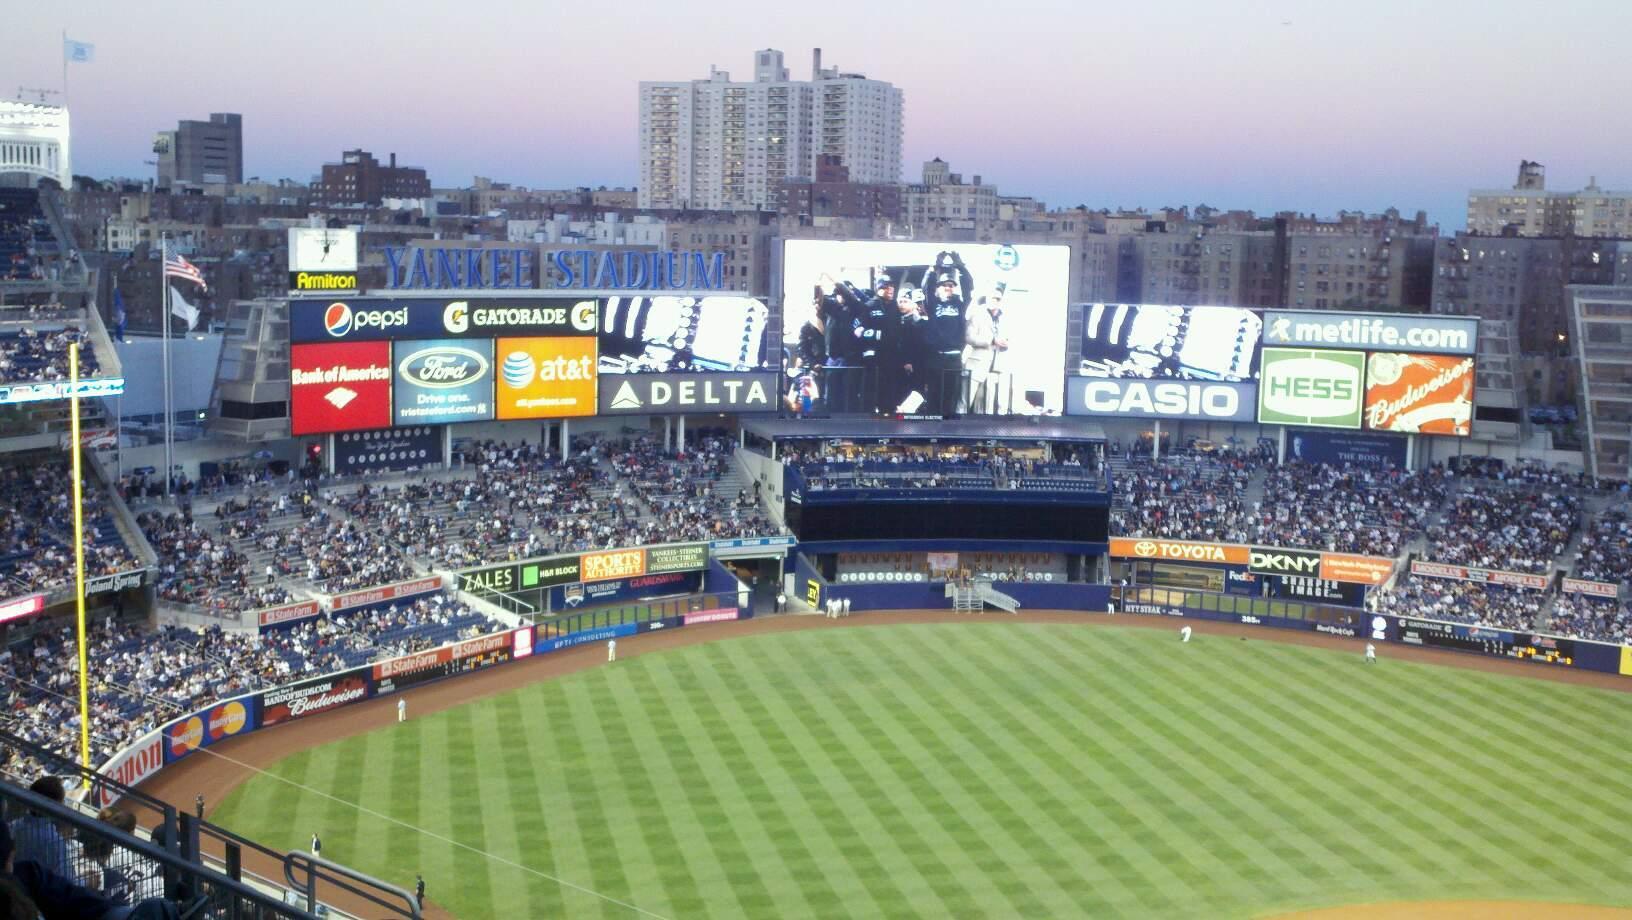 Yankee Stadium Abschnitt 422 Reihe 5 Platz 20